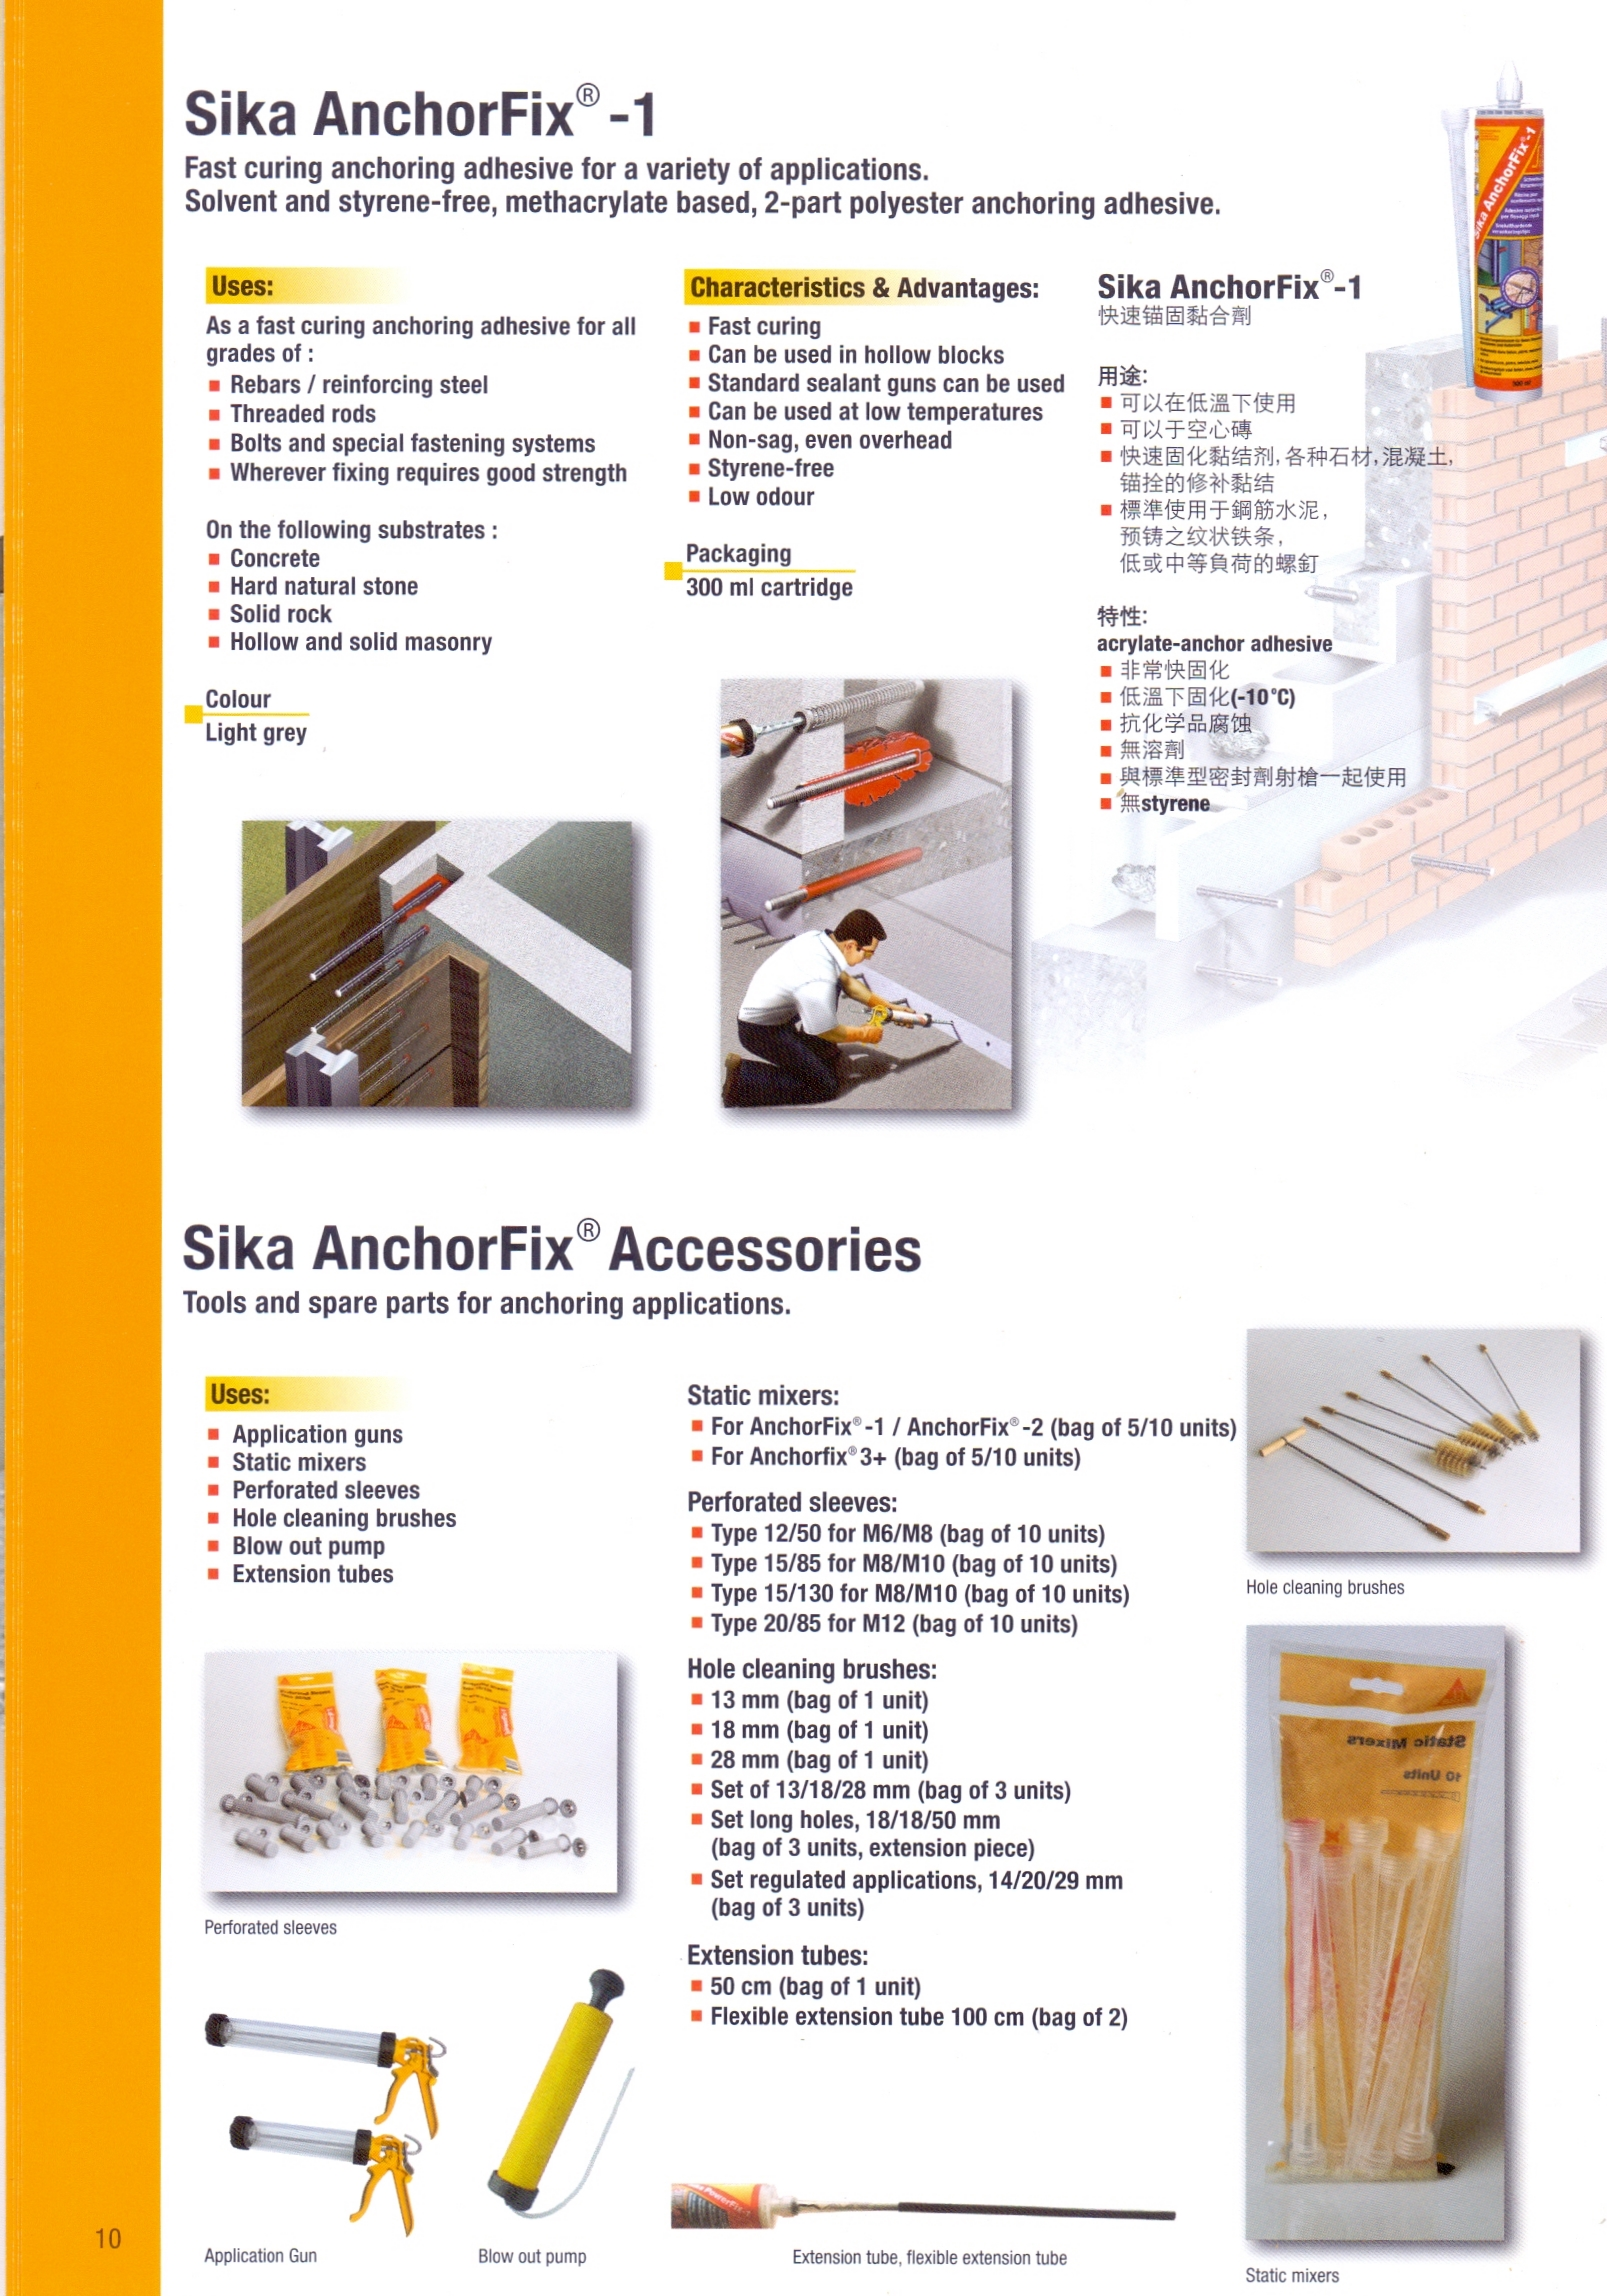 Sika AnchorFix - 1  Sika AnchorFix Accessories